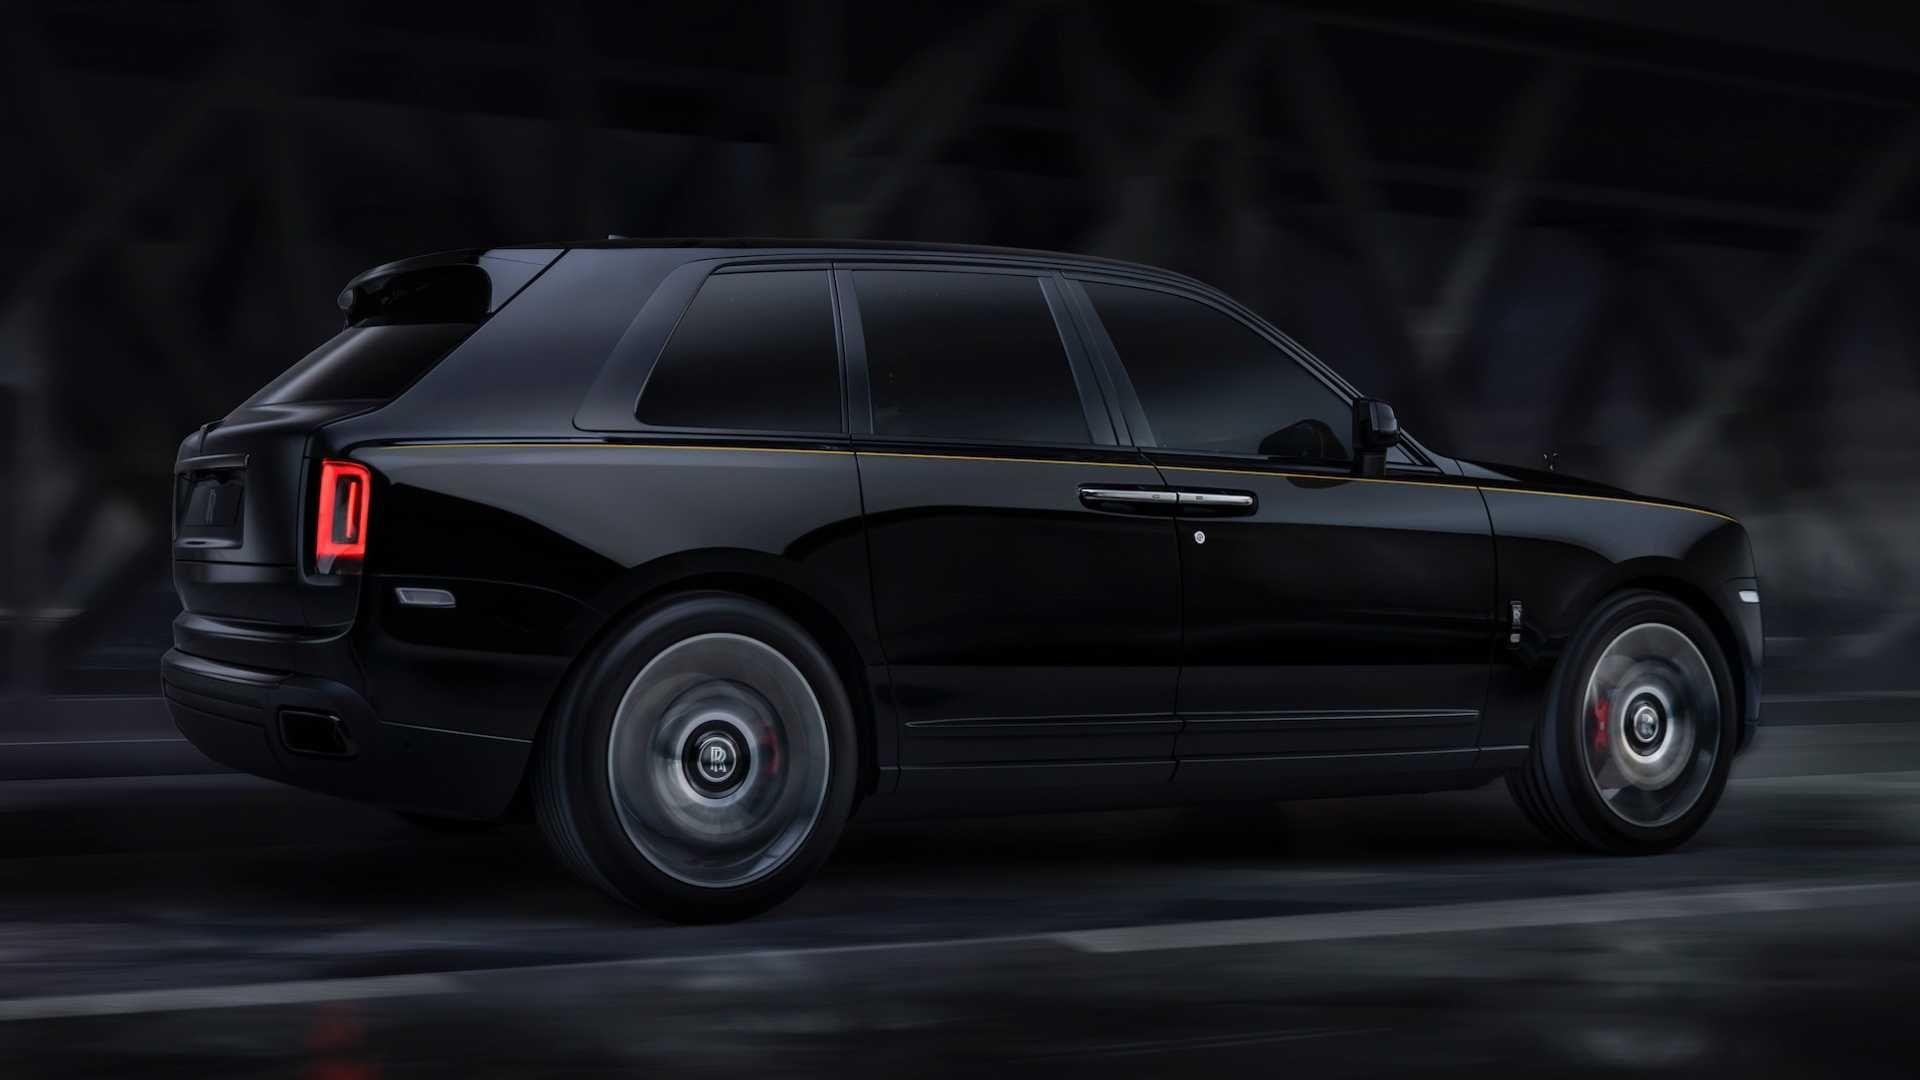 Rolls-Royce представил обновленную модификацию кроссовера Cullinan (Фото) 1